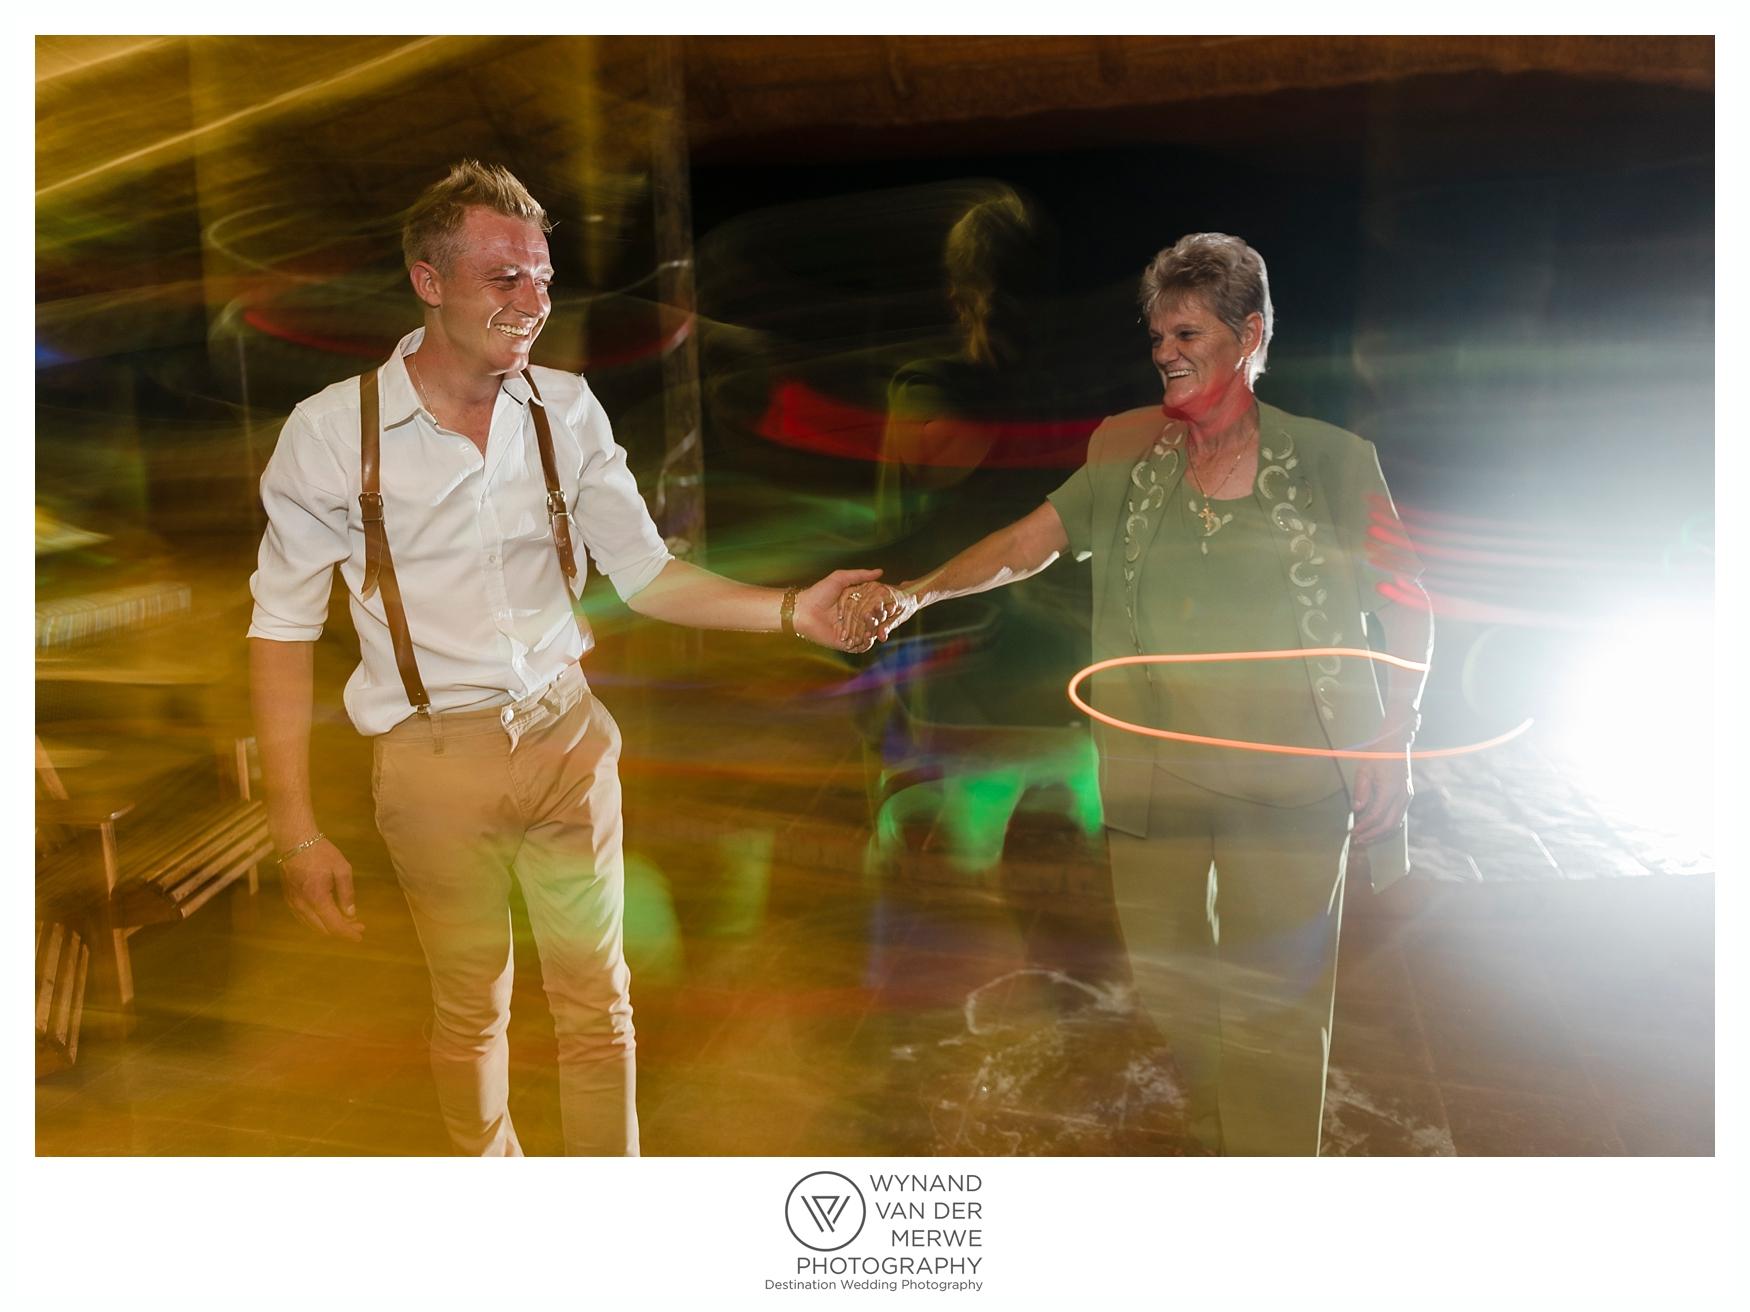 WynandvanderMerwe_weddingphotography_bushveldwedding_northam_bushveld_limpopowedding_limpopo_southafrica-422.jpg